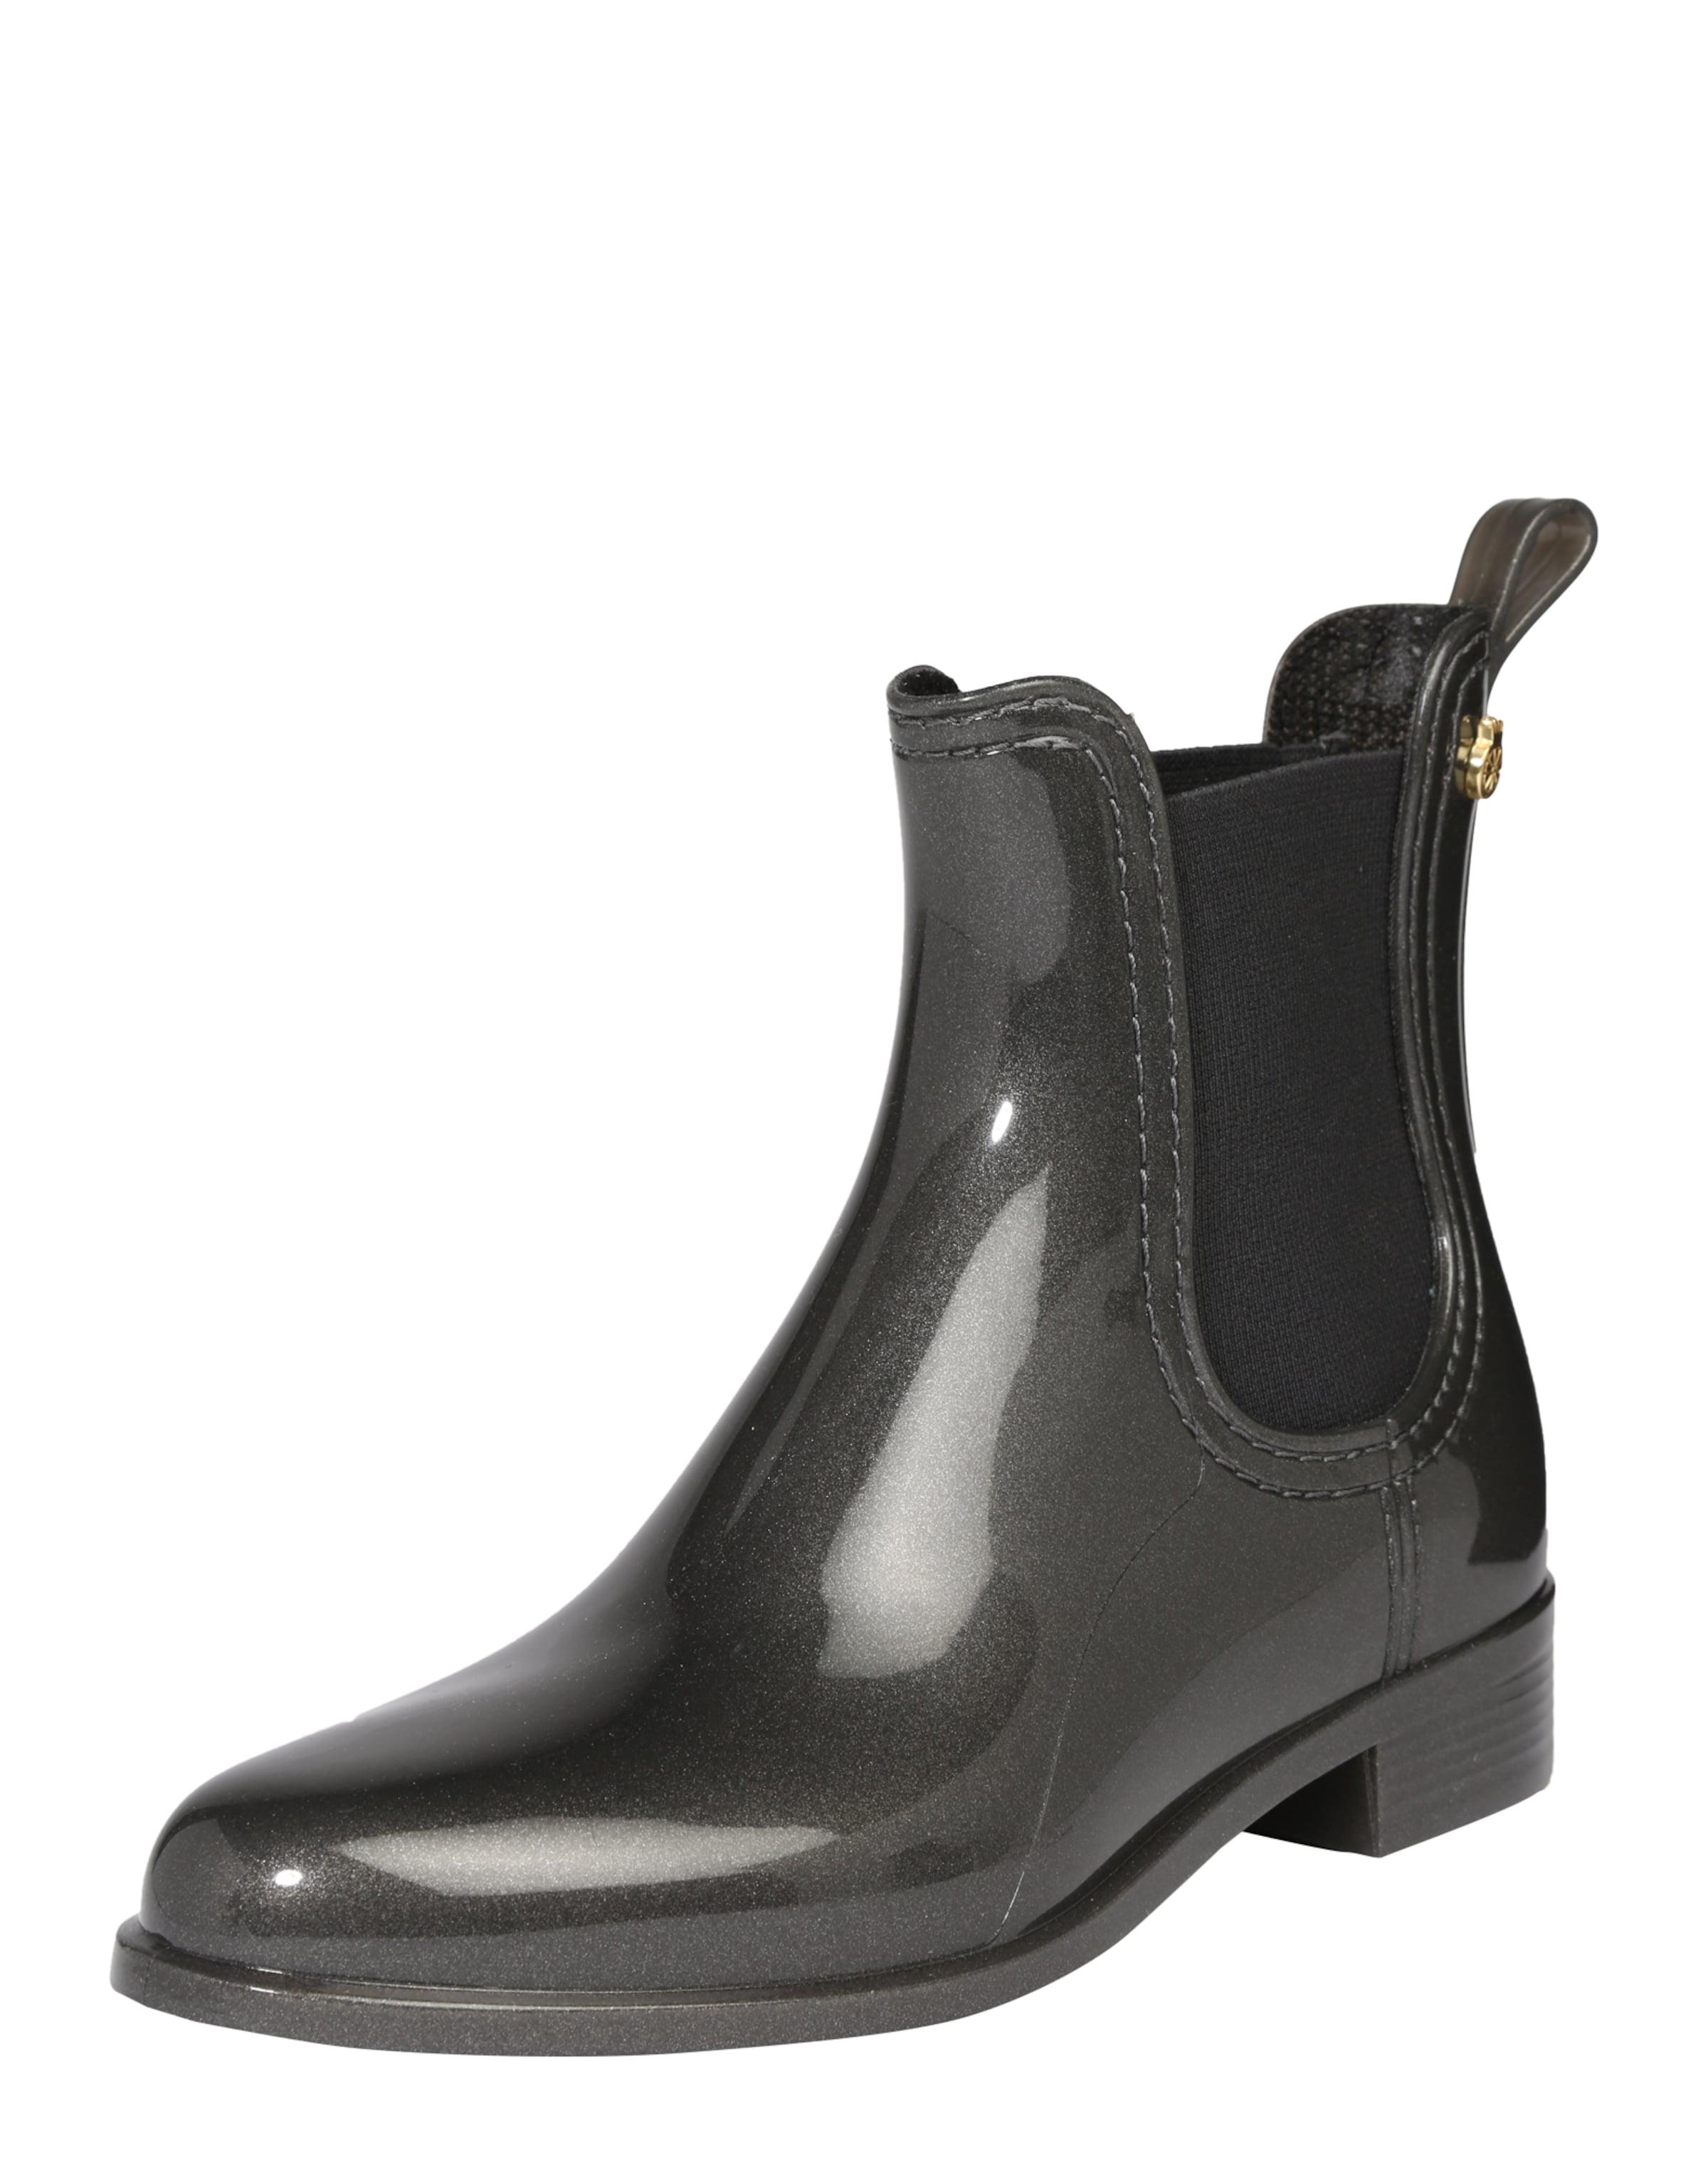 LEMON JELLY Gummistiefel Comfy Verschleißfeste billige Schuhe